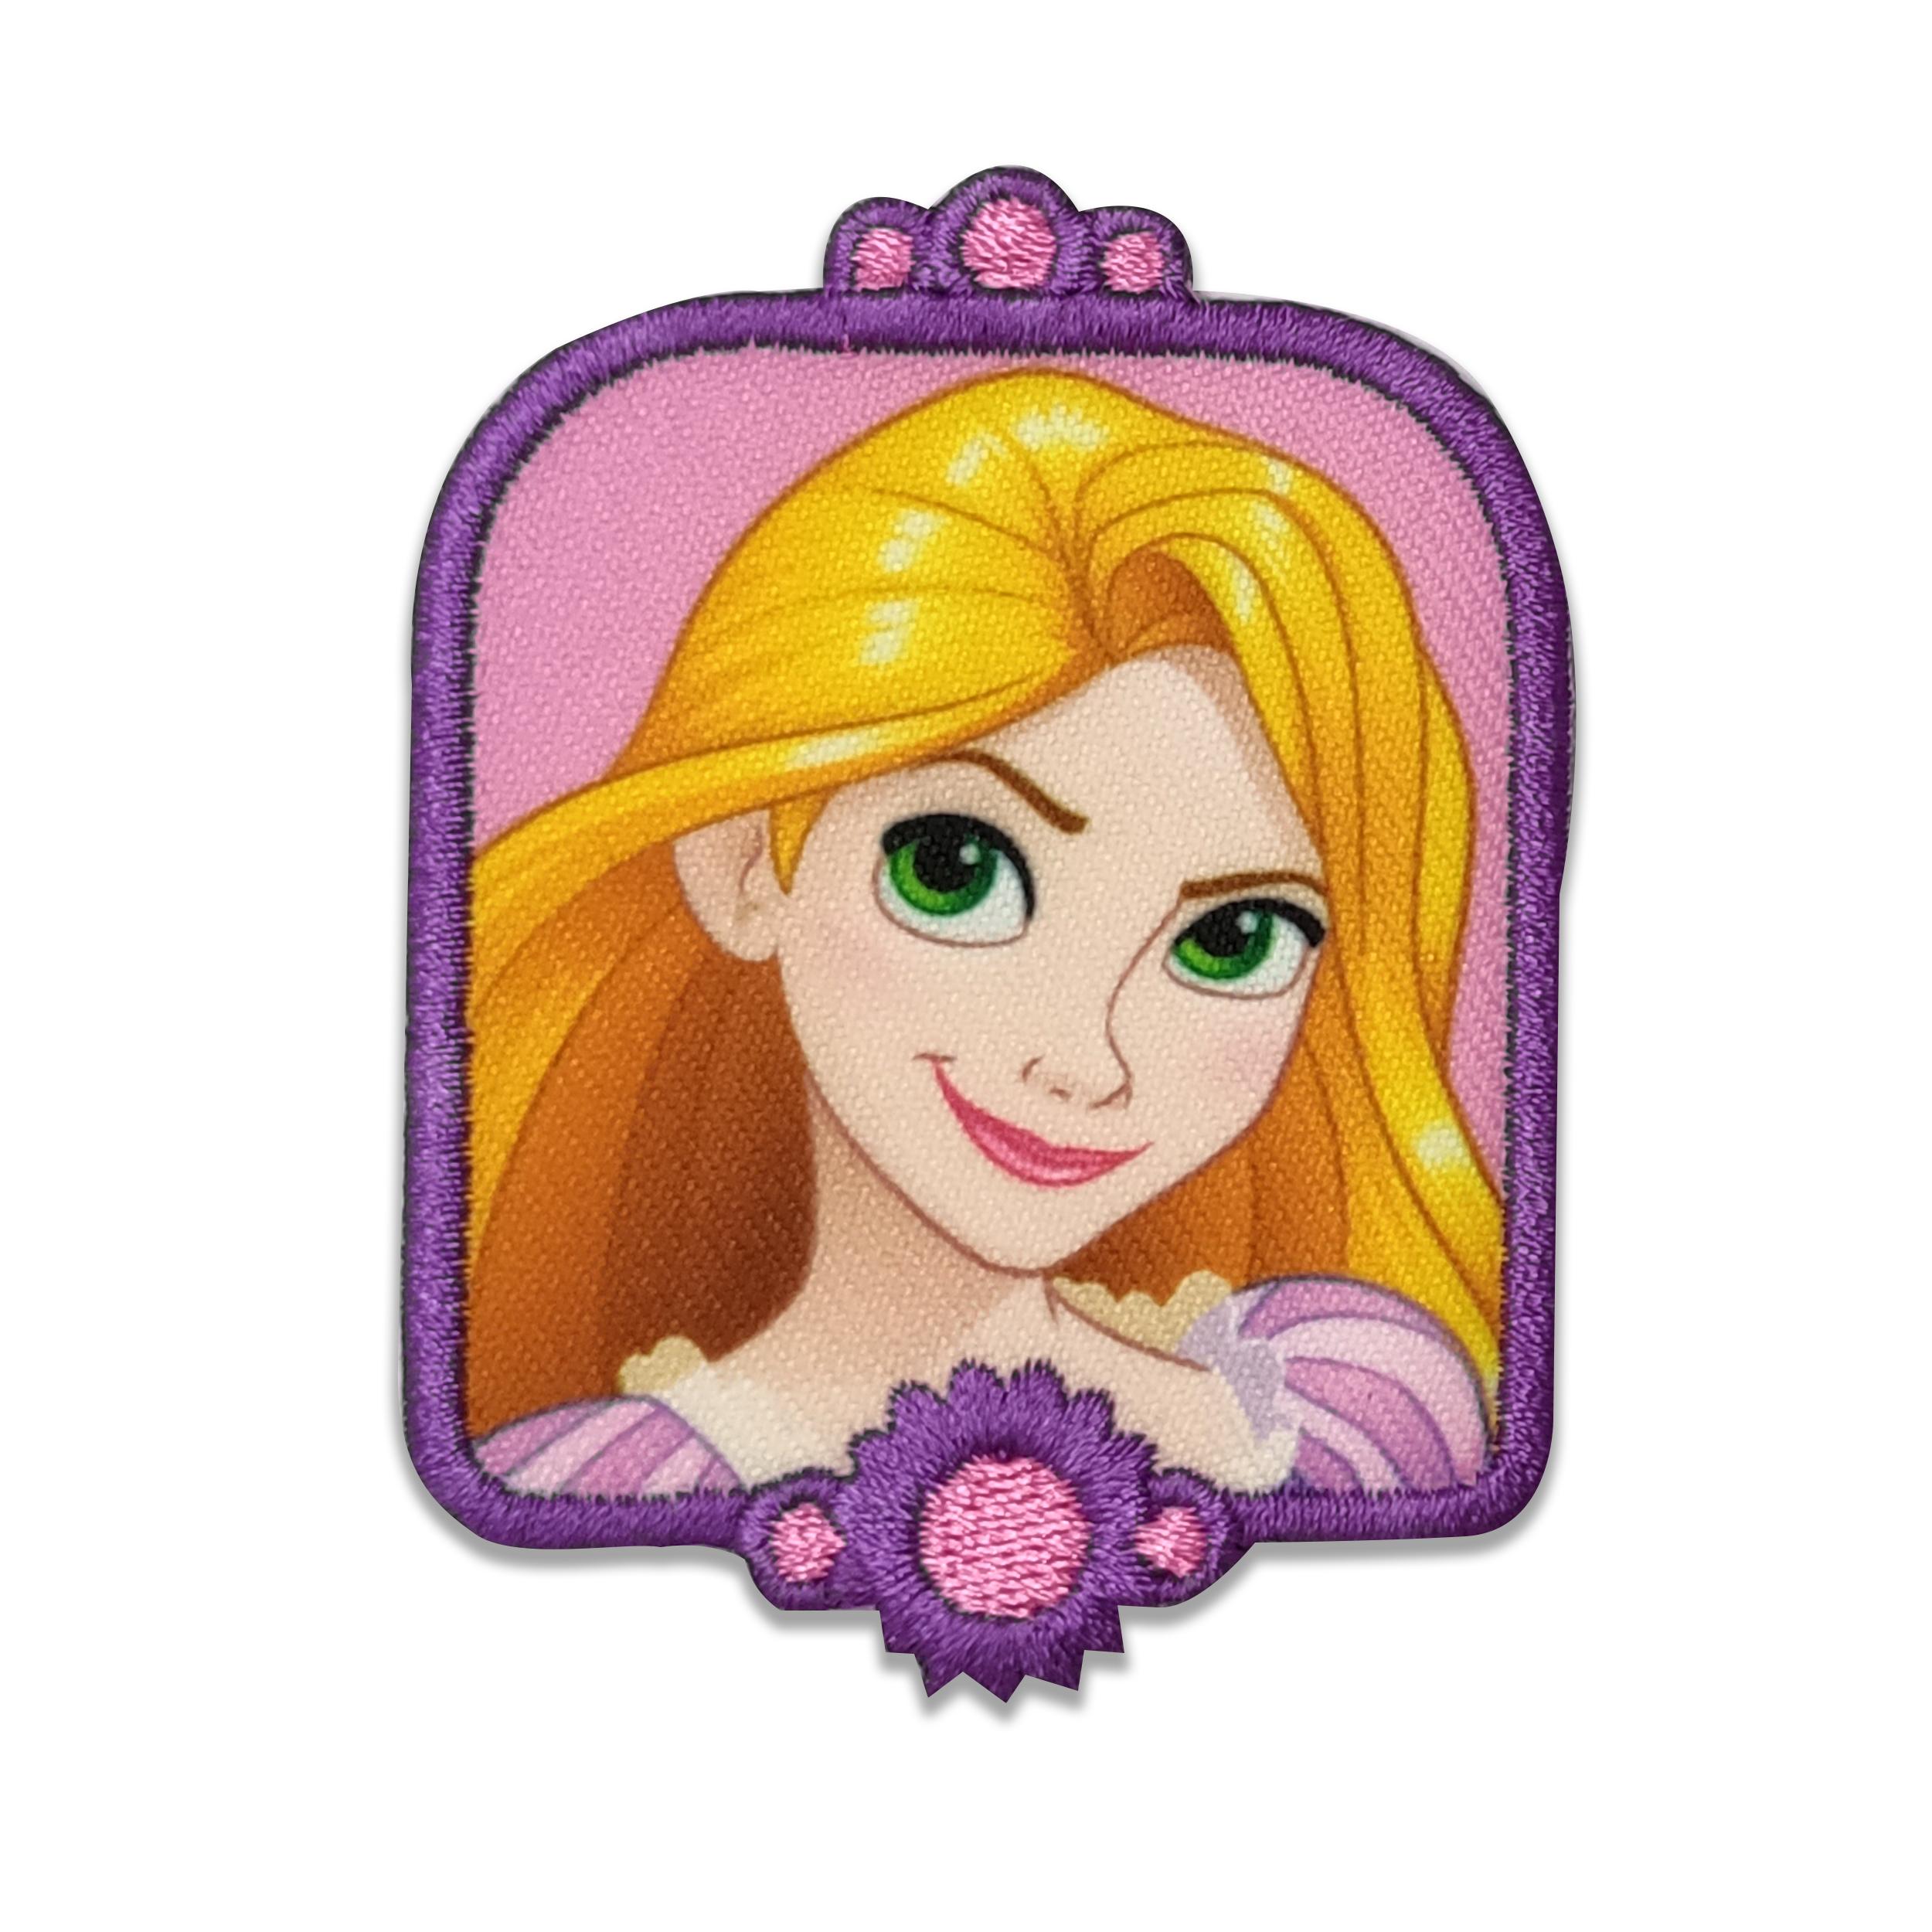 Applicazione Termoadesiva Principessa Disney Rapunzel